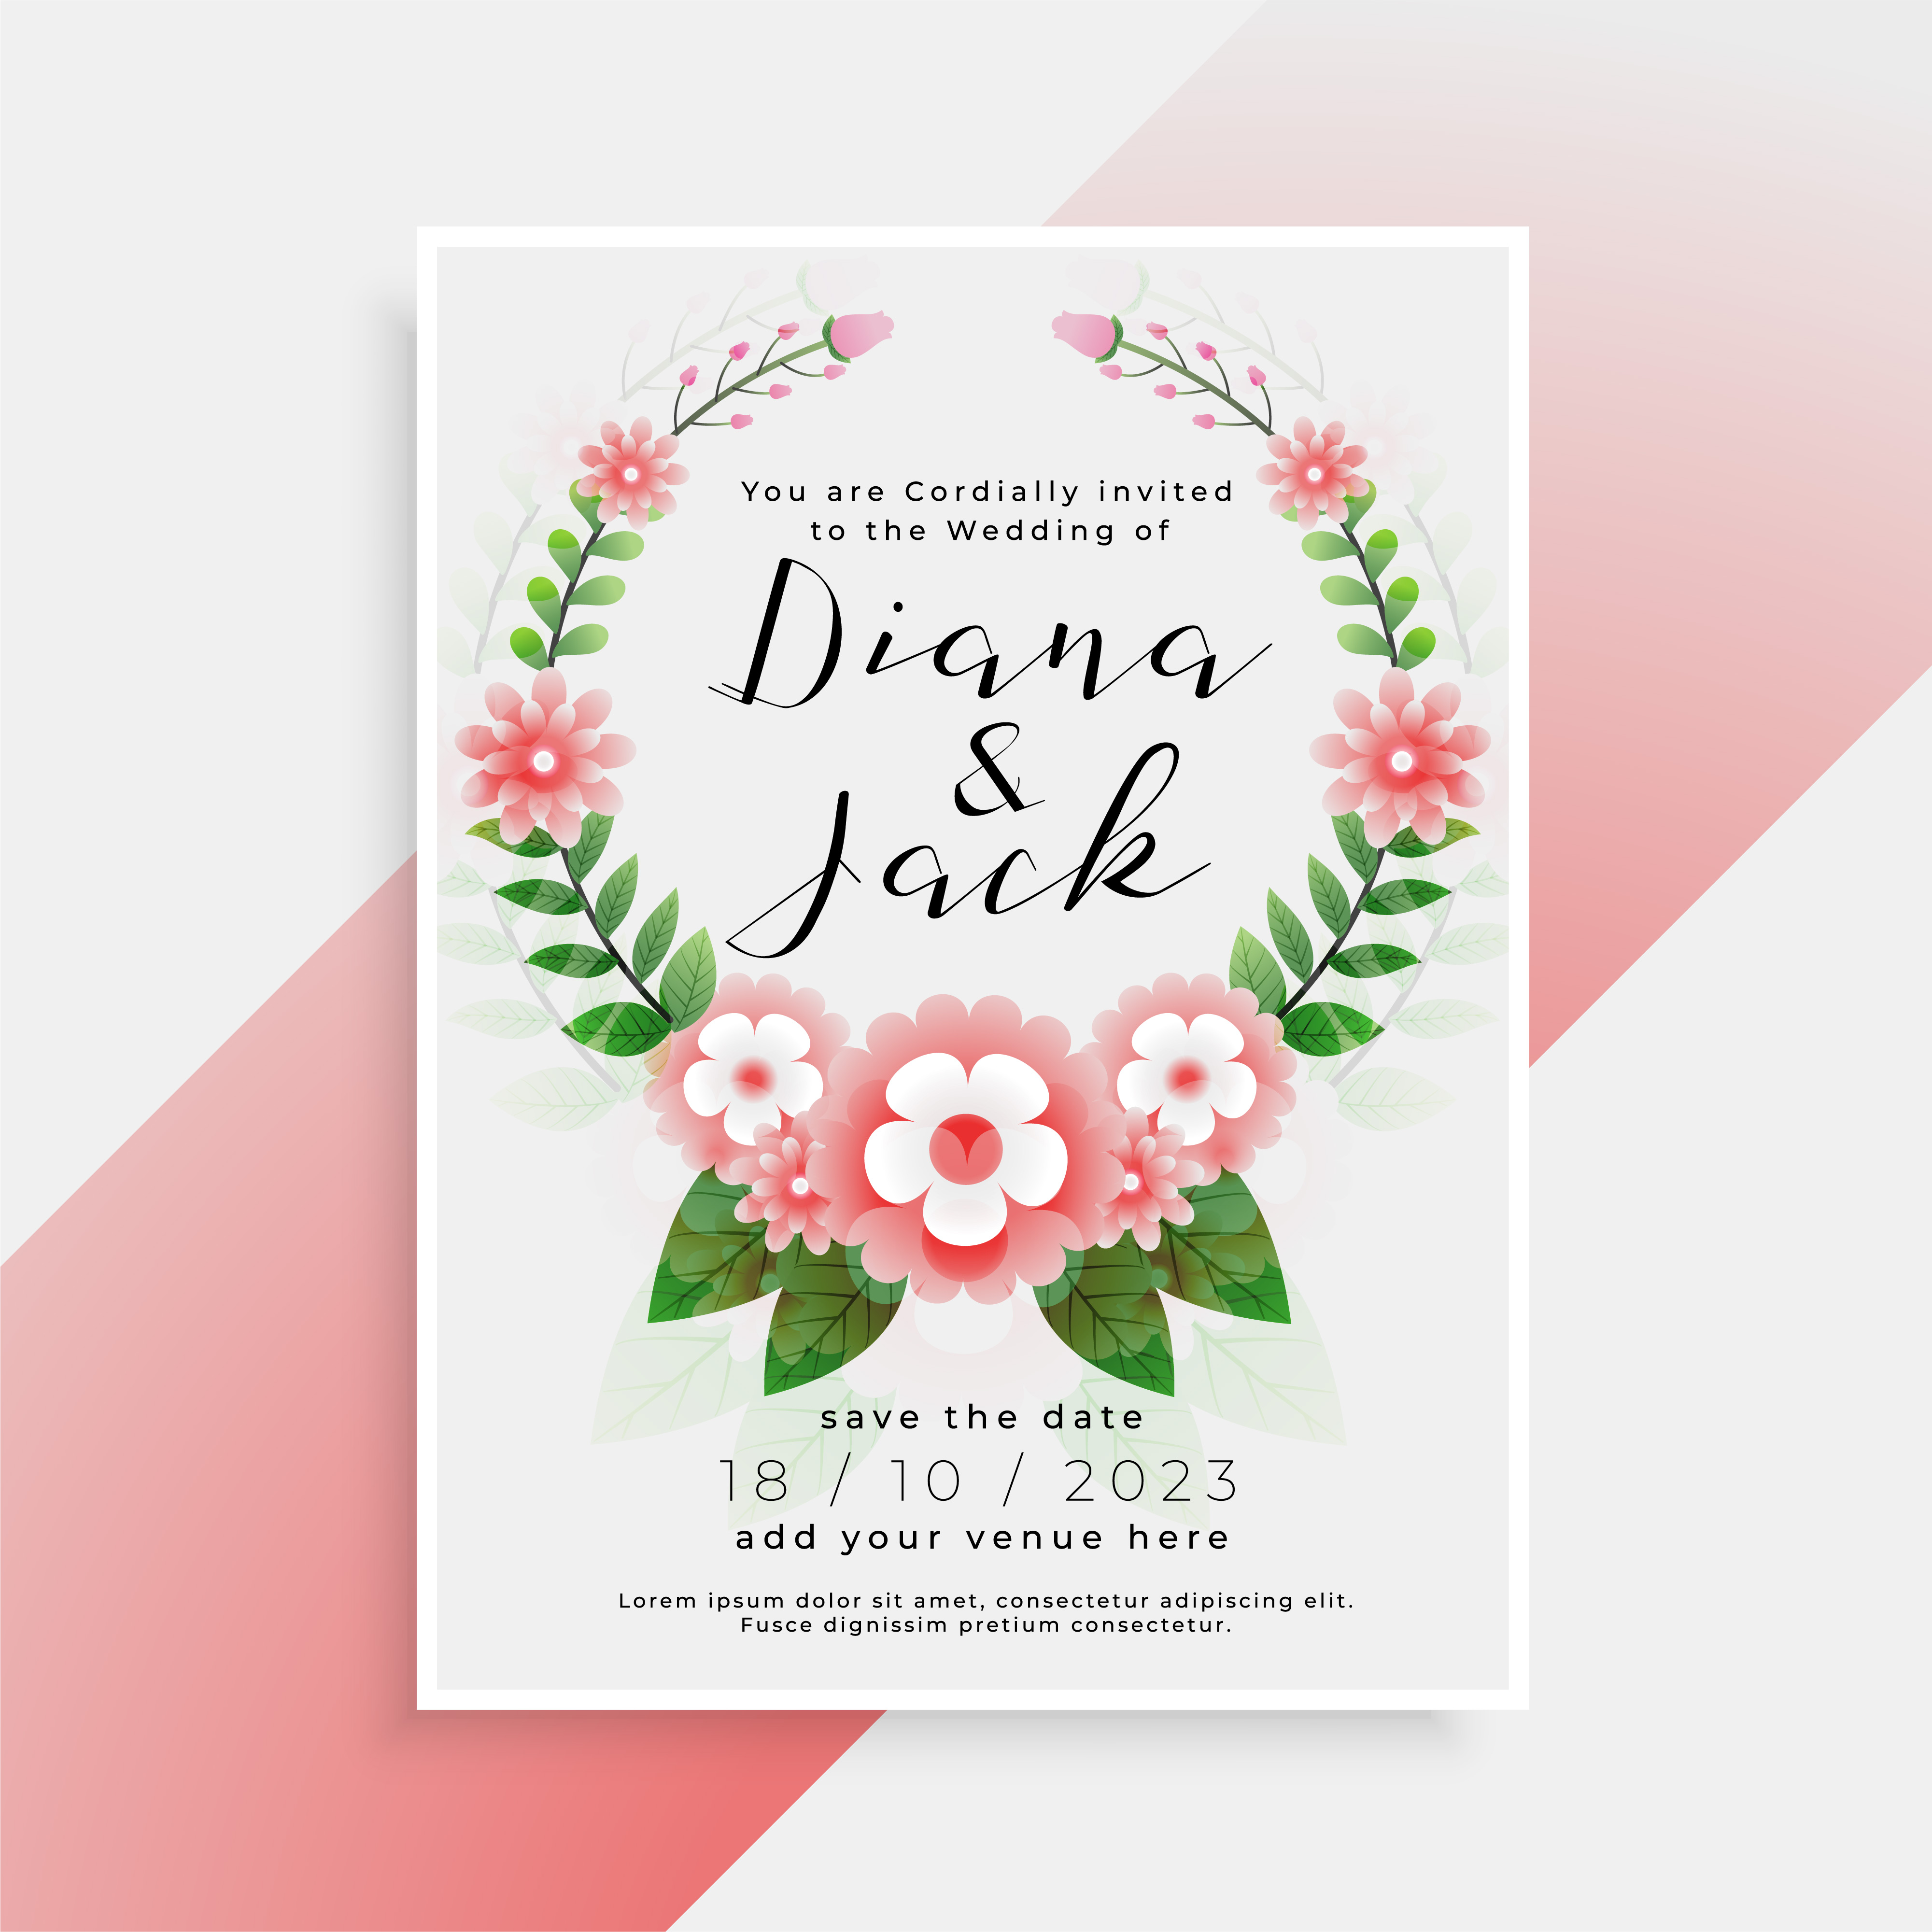 beautiful floral wedding card invitation design  download